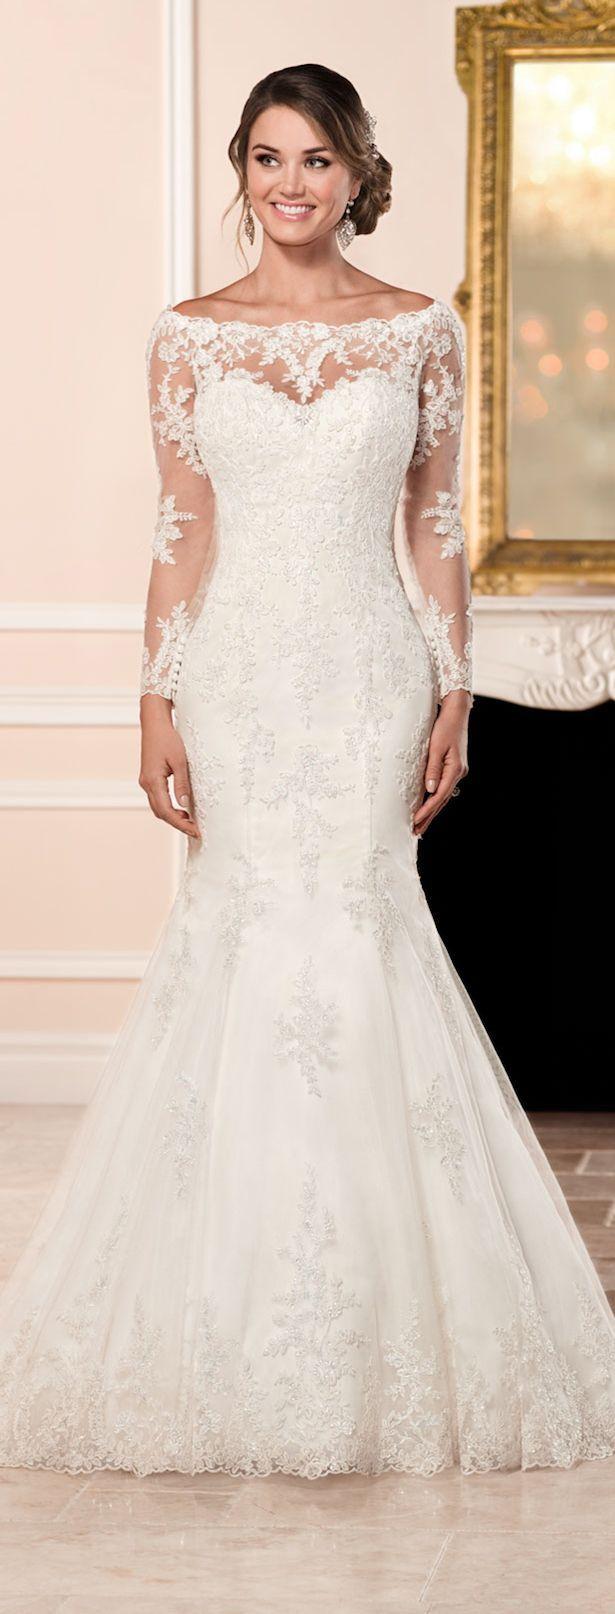 best wedding dress images on pinterest wedding dressses